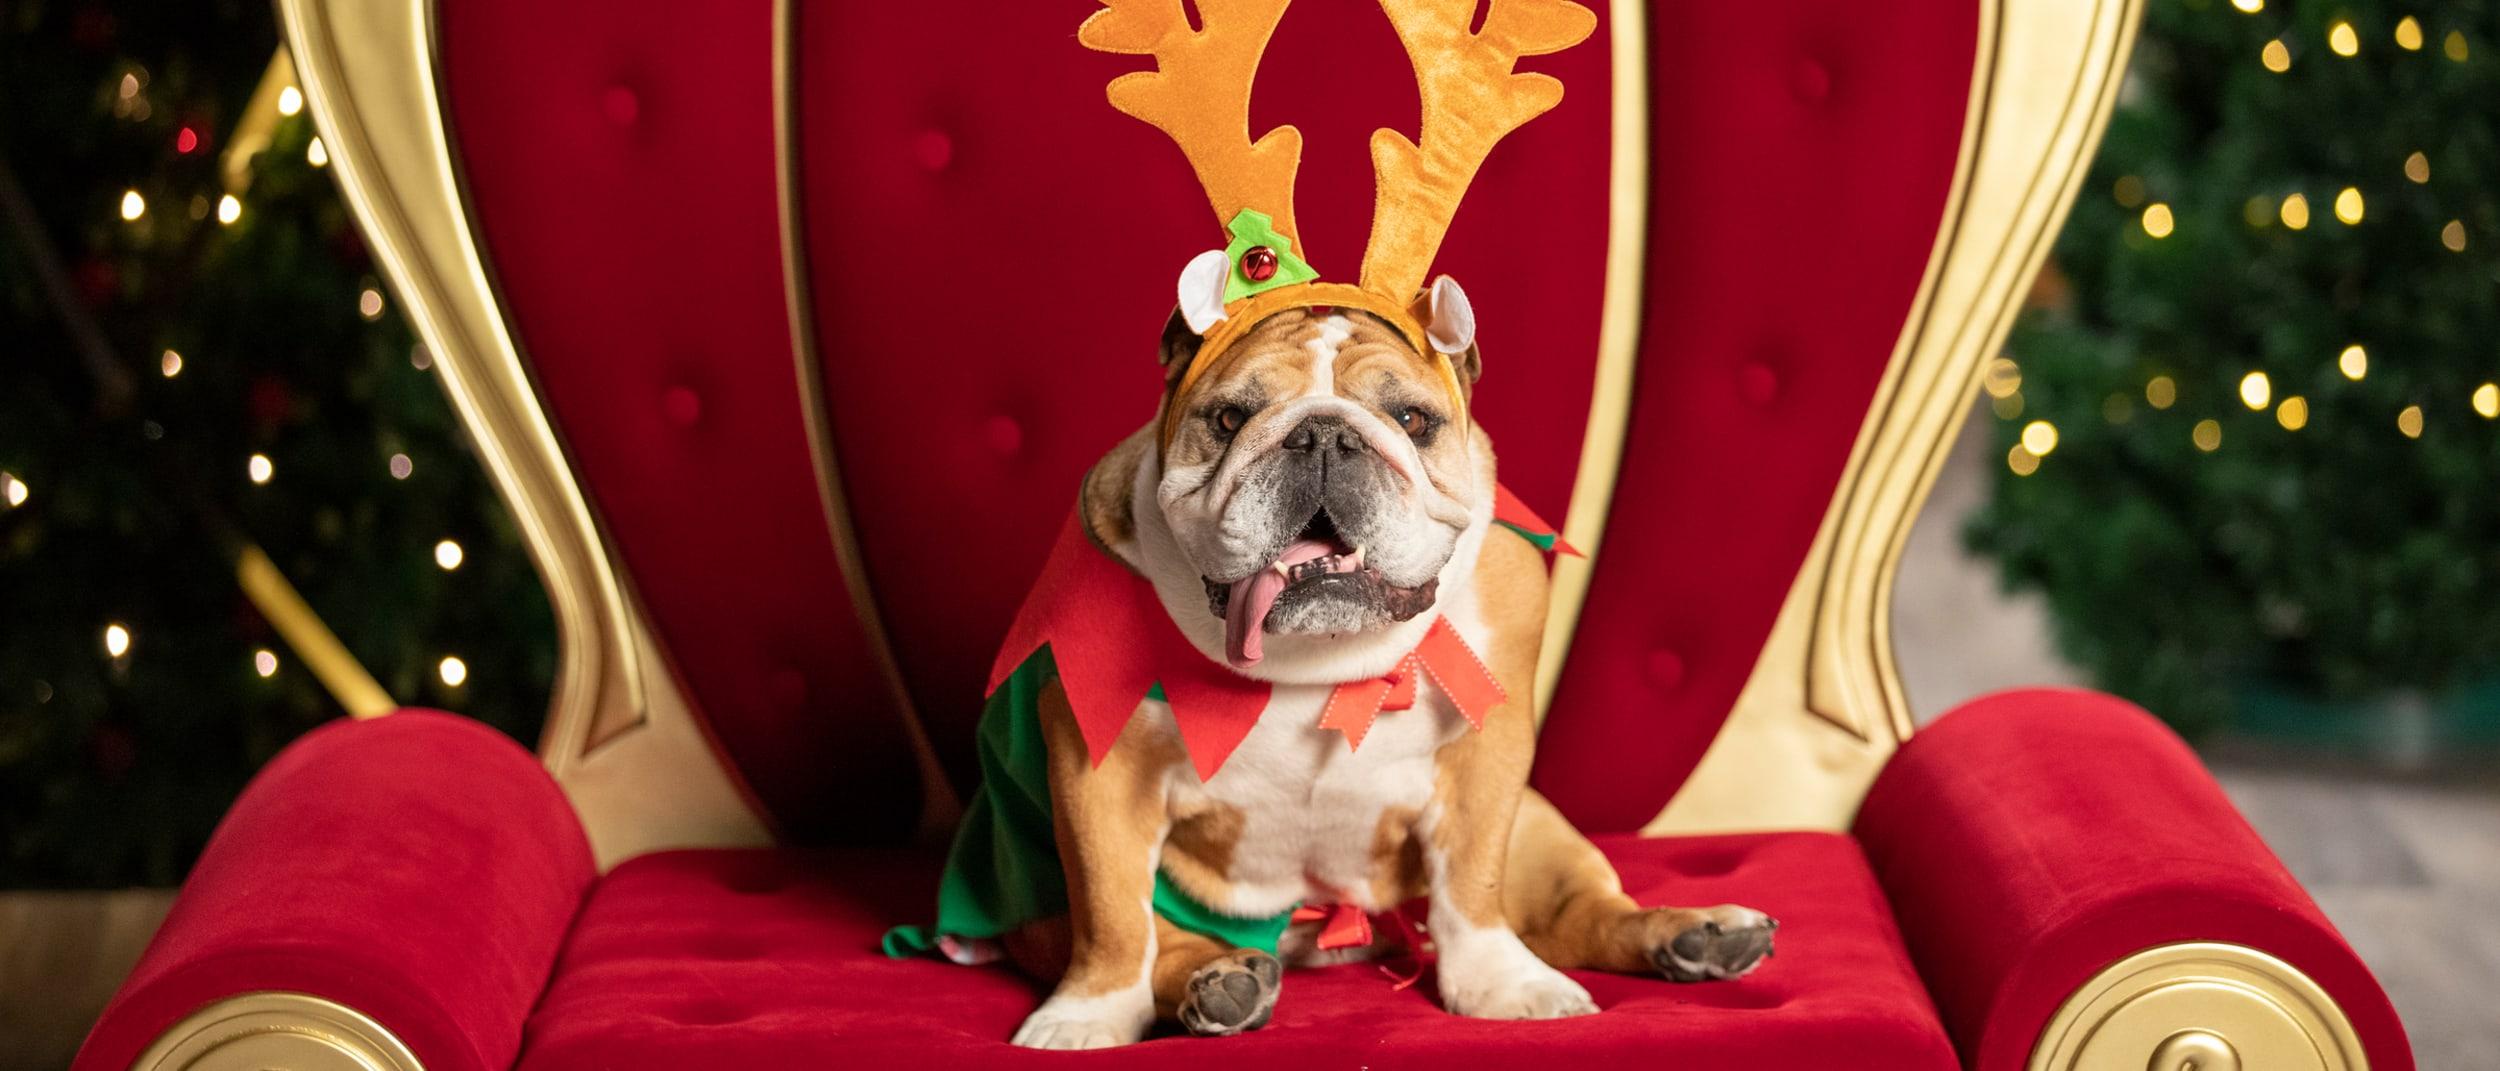 Pet photography: Santa photos with the whole family